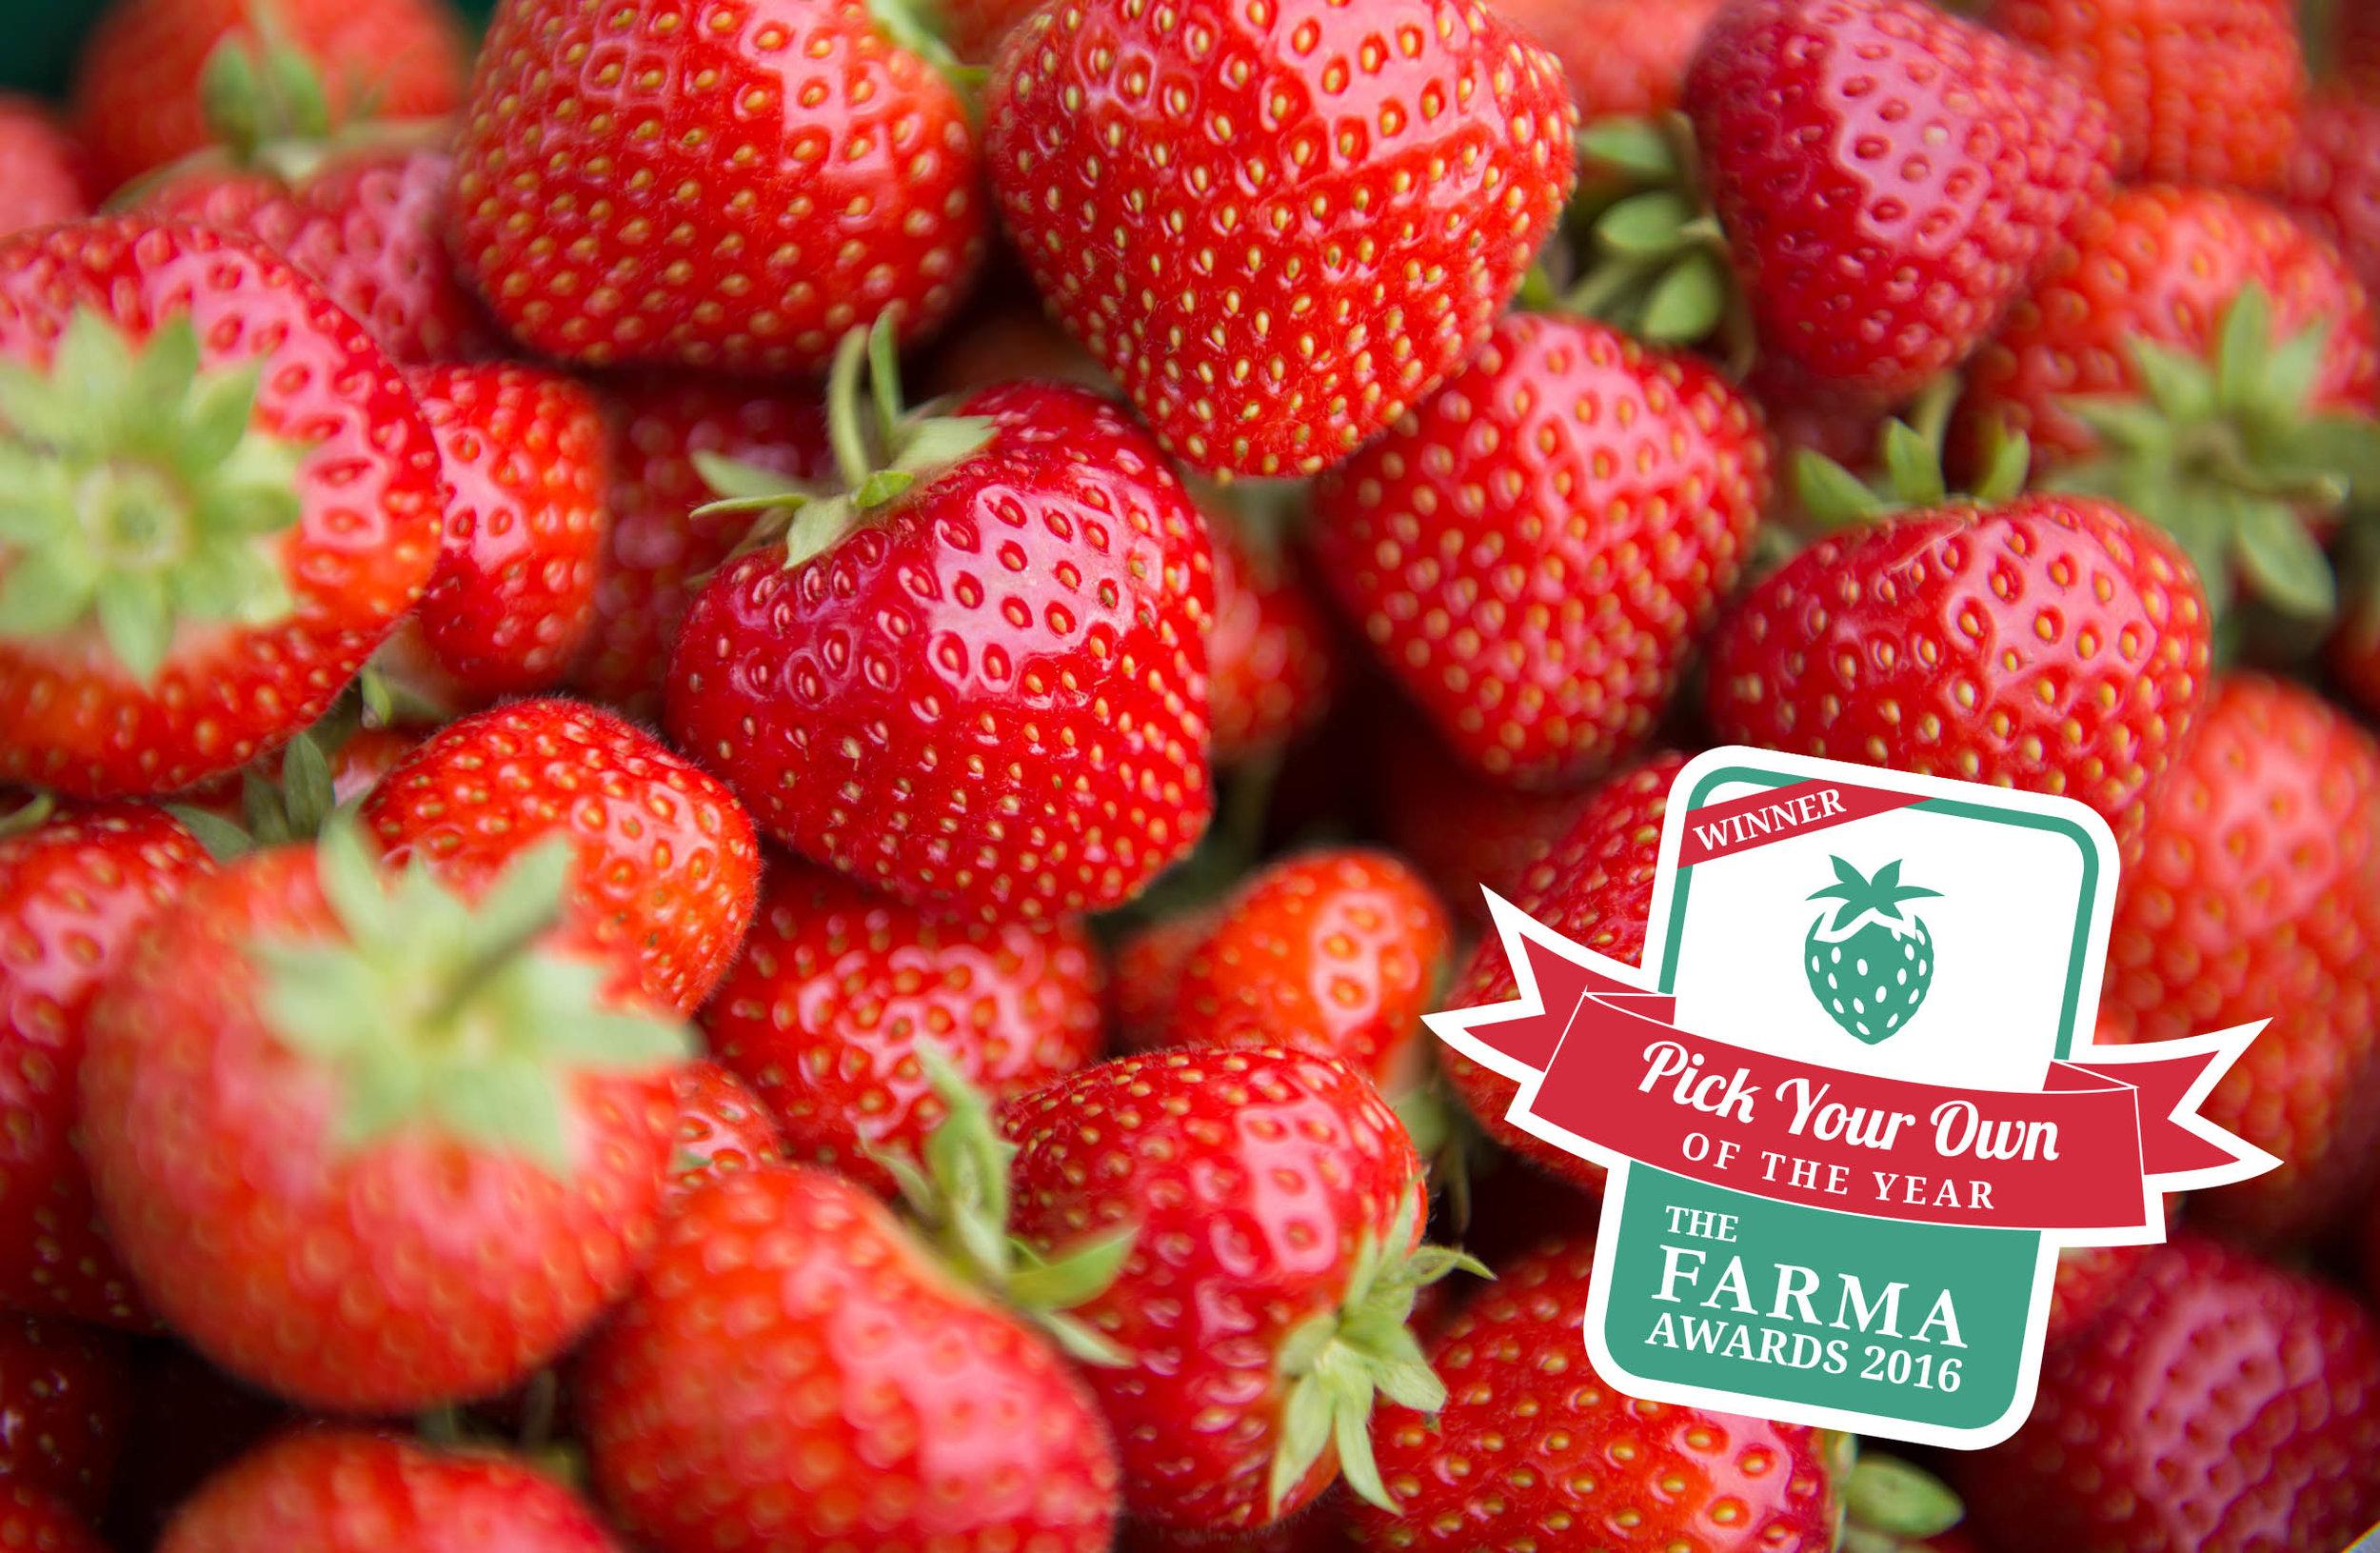 Lotmead_Farm_149_FARMA.jpg